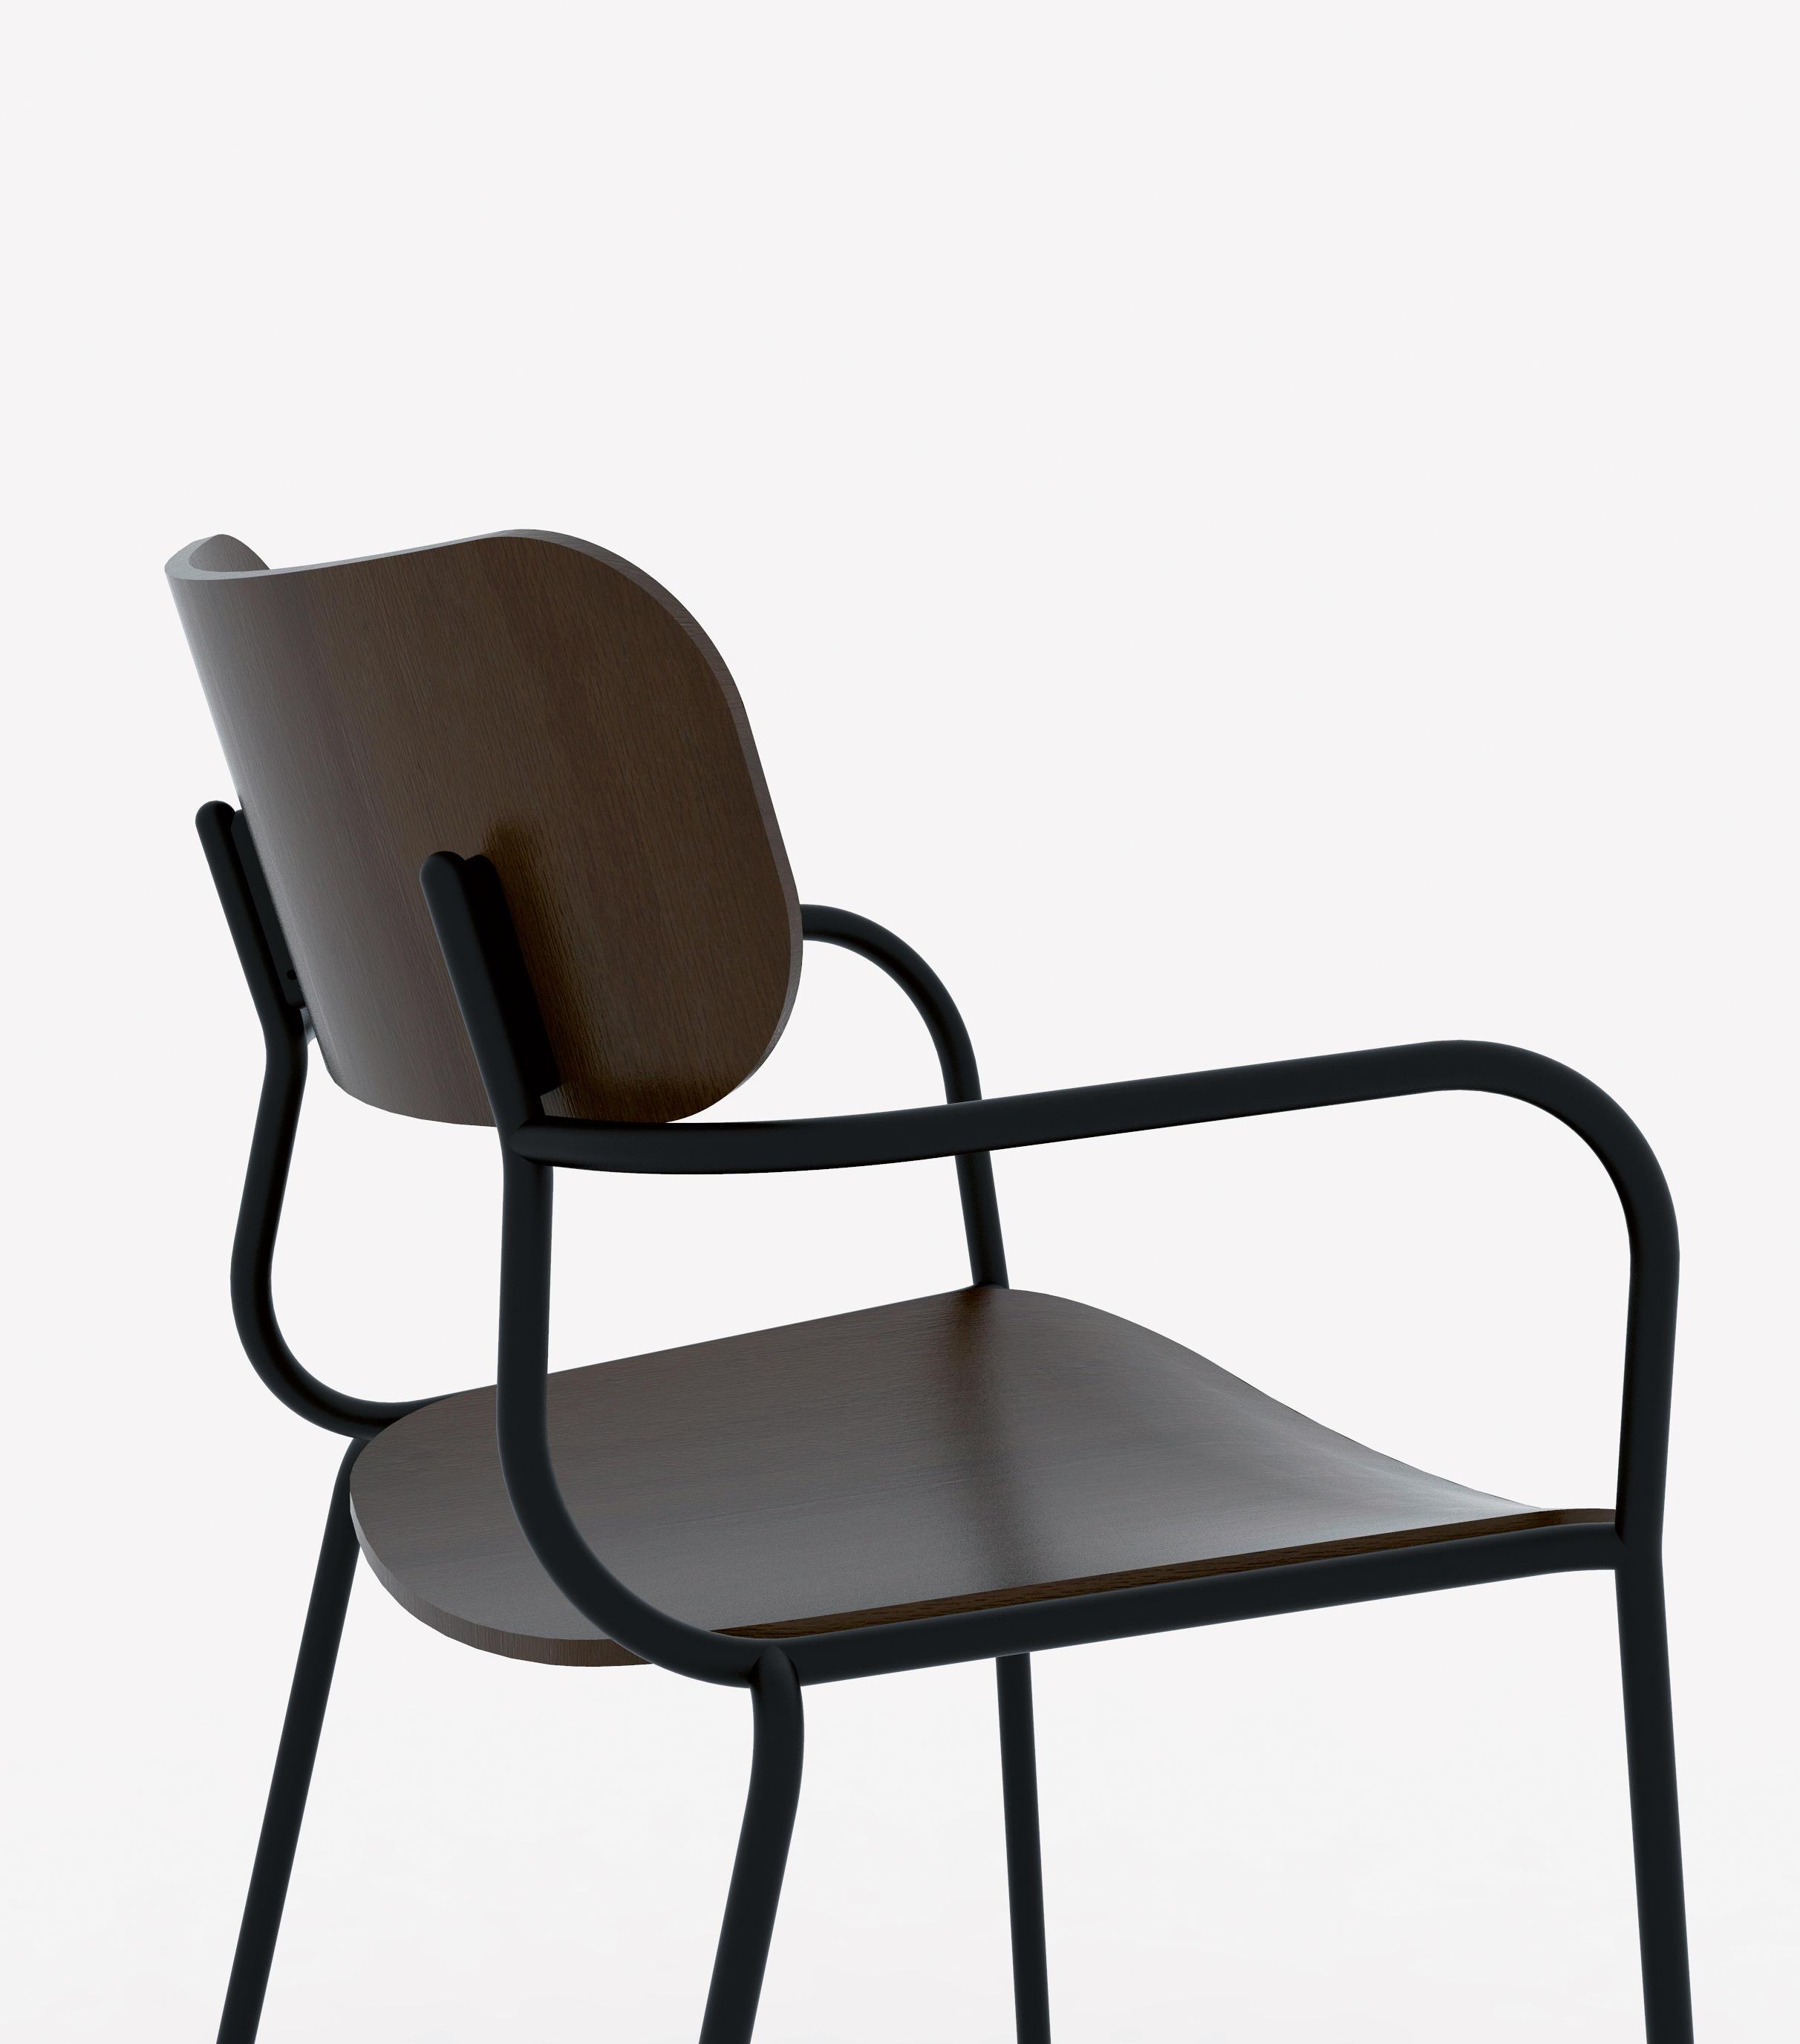 Kiyumi Collection by Tomoya Tabuchi for Arrmet